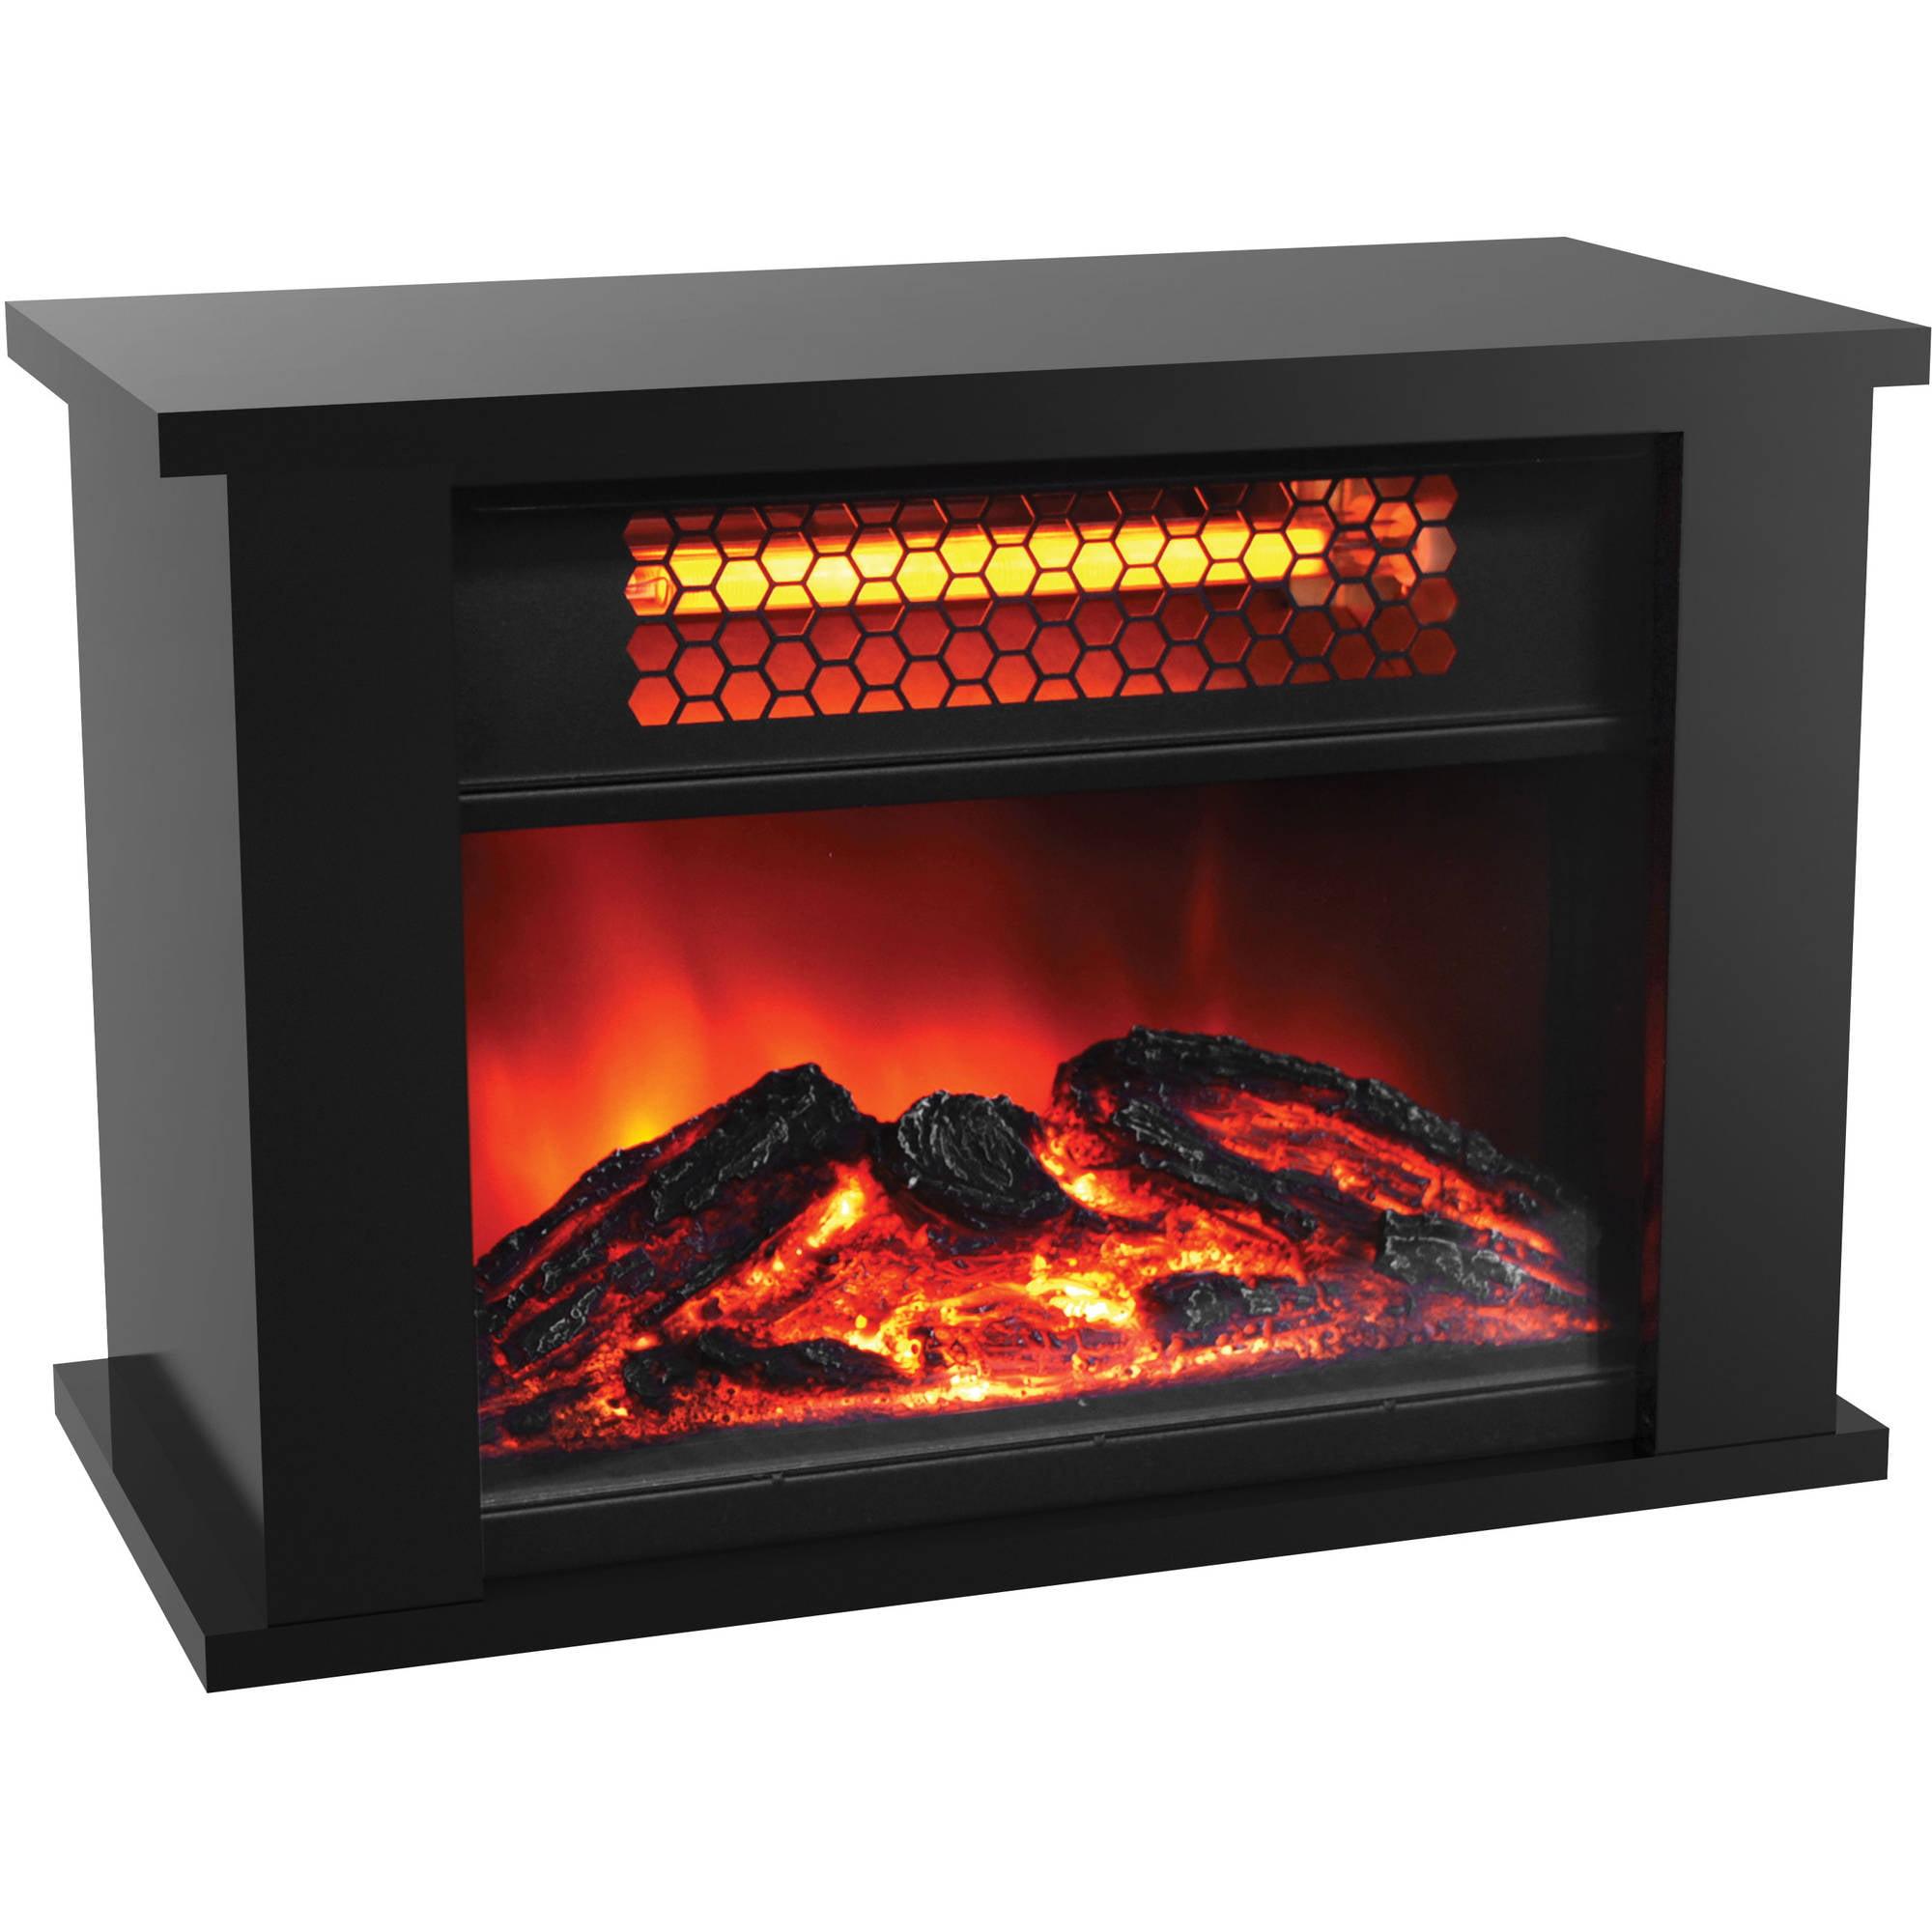 Lifepro Mini Infrared Fireplace Heater Black Walmart Com